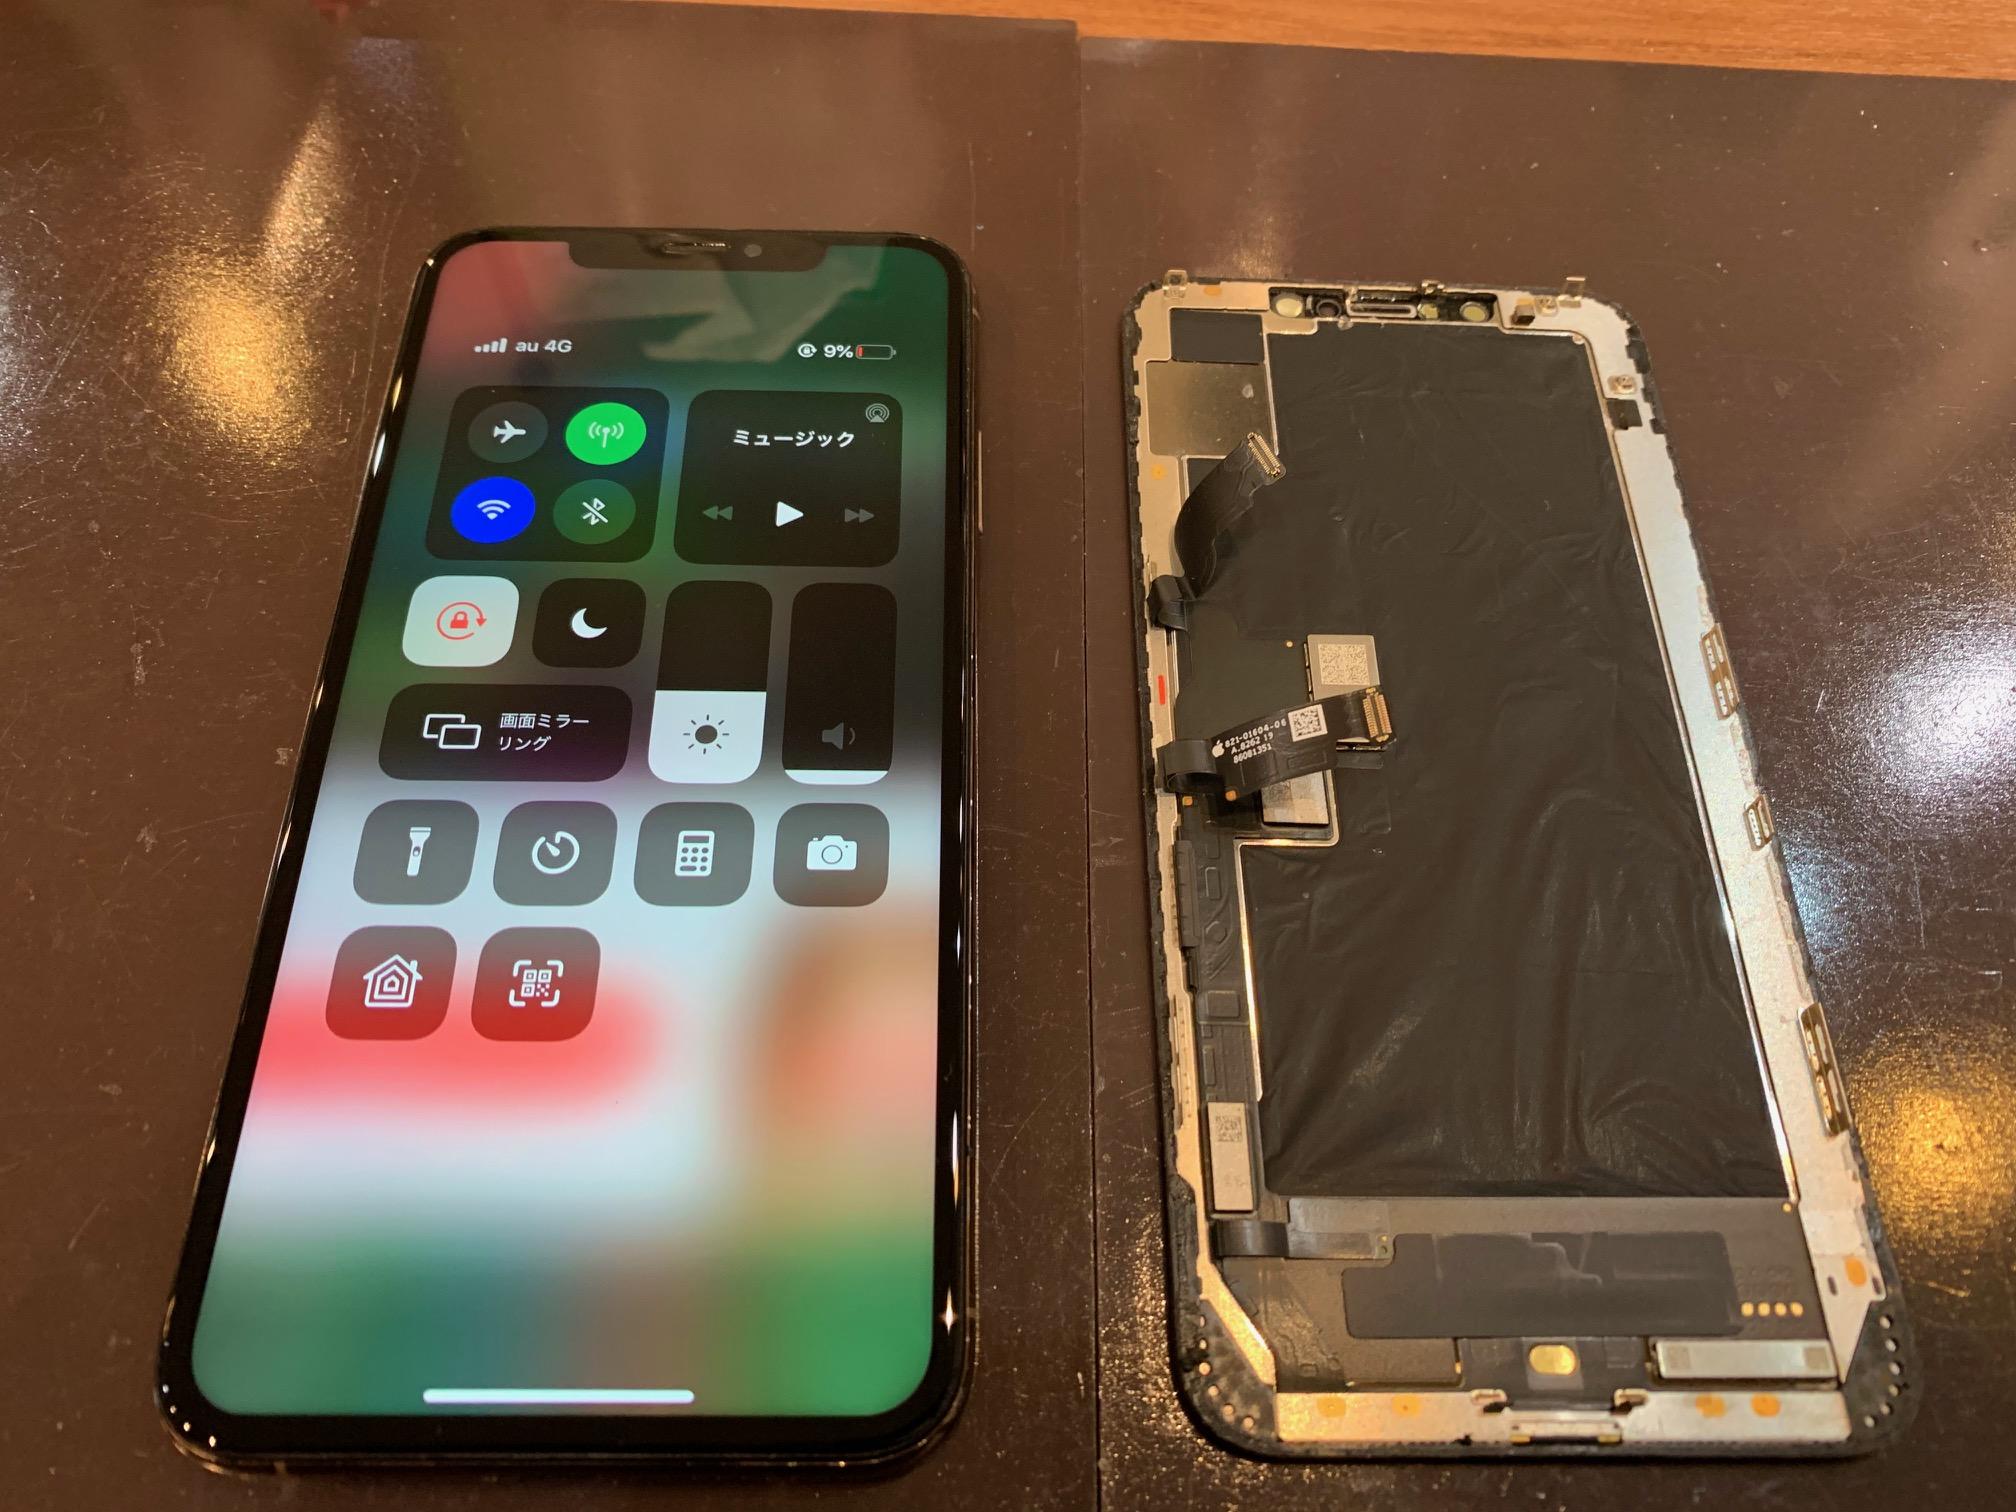 iPhoneXsMax水没修理 <伊丹市よりお越しのお客様> ち